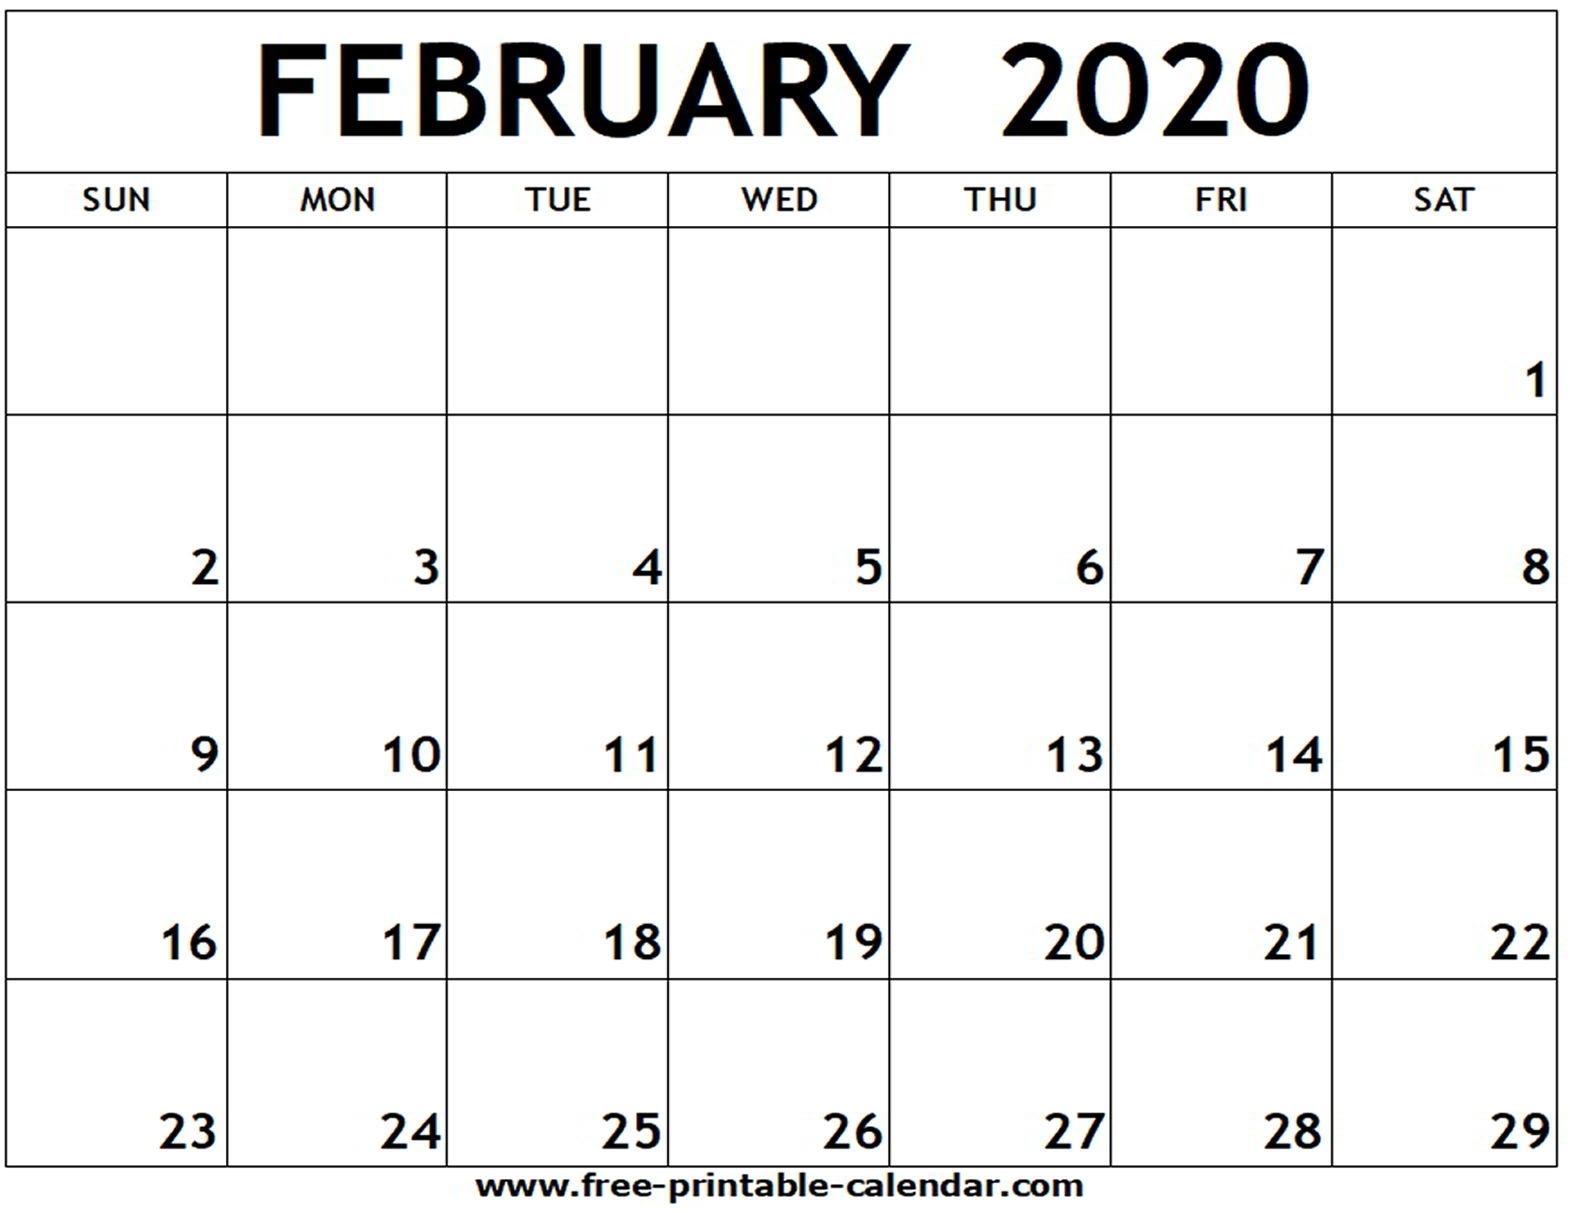 February 2020 Printable Calendar - Free-Printable-Calendar within 2020 Free Printable Calendars With Lines Without Downloading